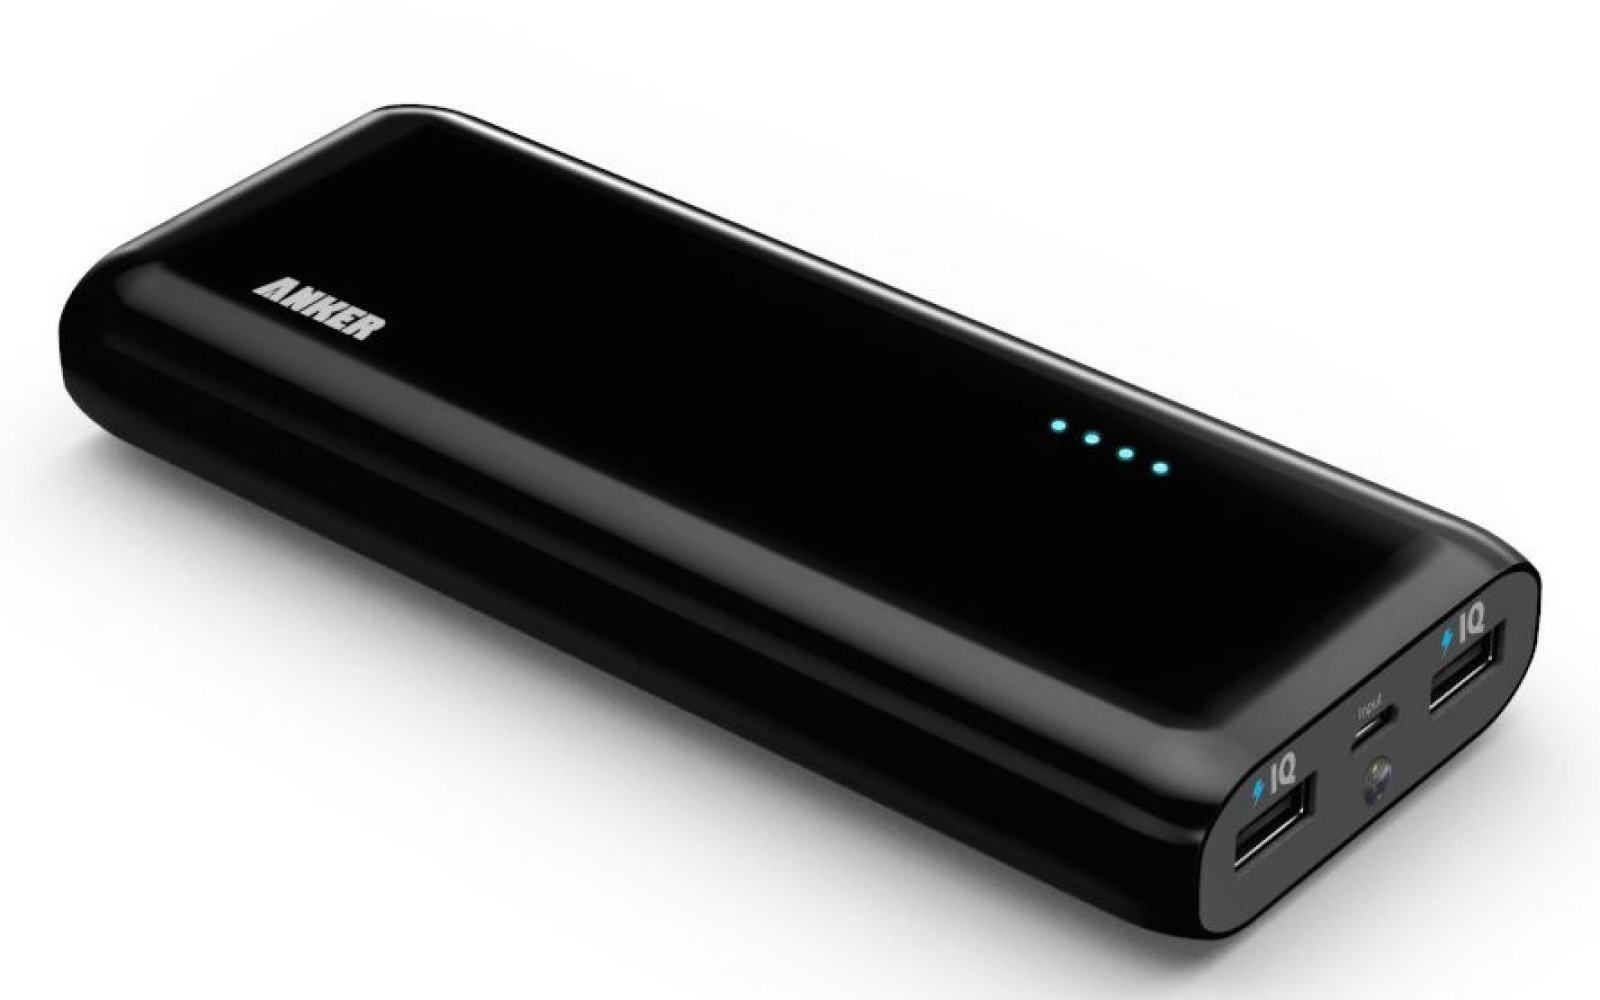 USB Battery Roundup: Anker 13000mAh $30, RAVPower 8400mAh $20, Lepow Stone 6000mAh $16, more